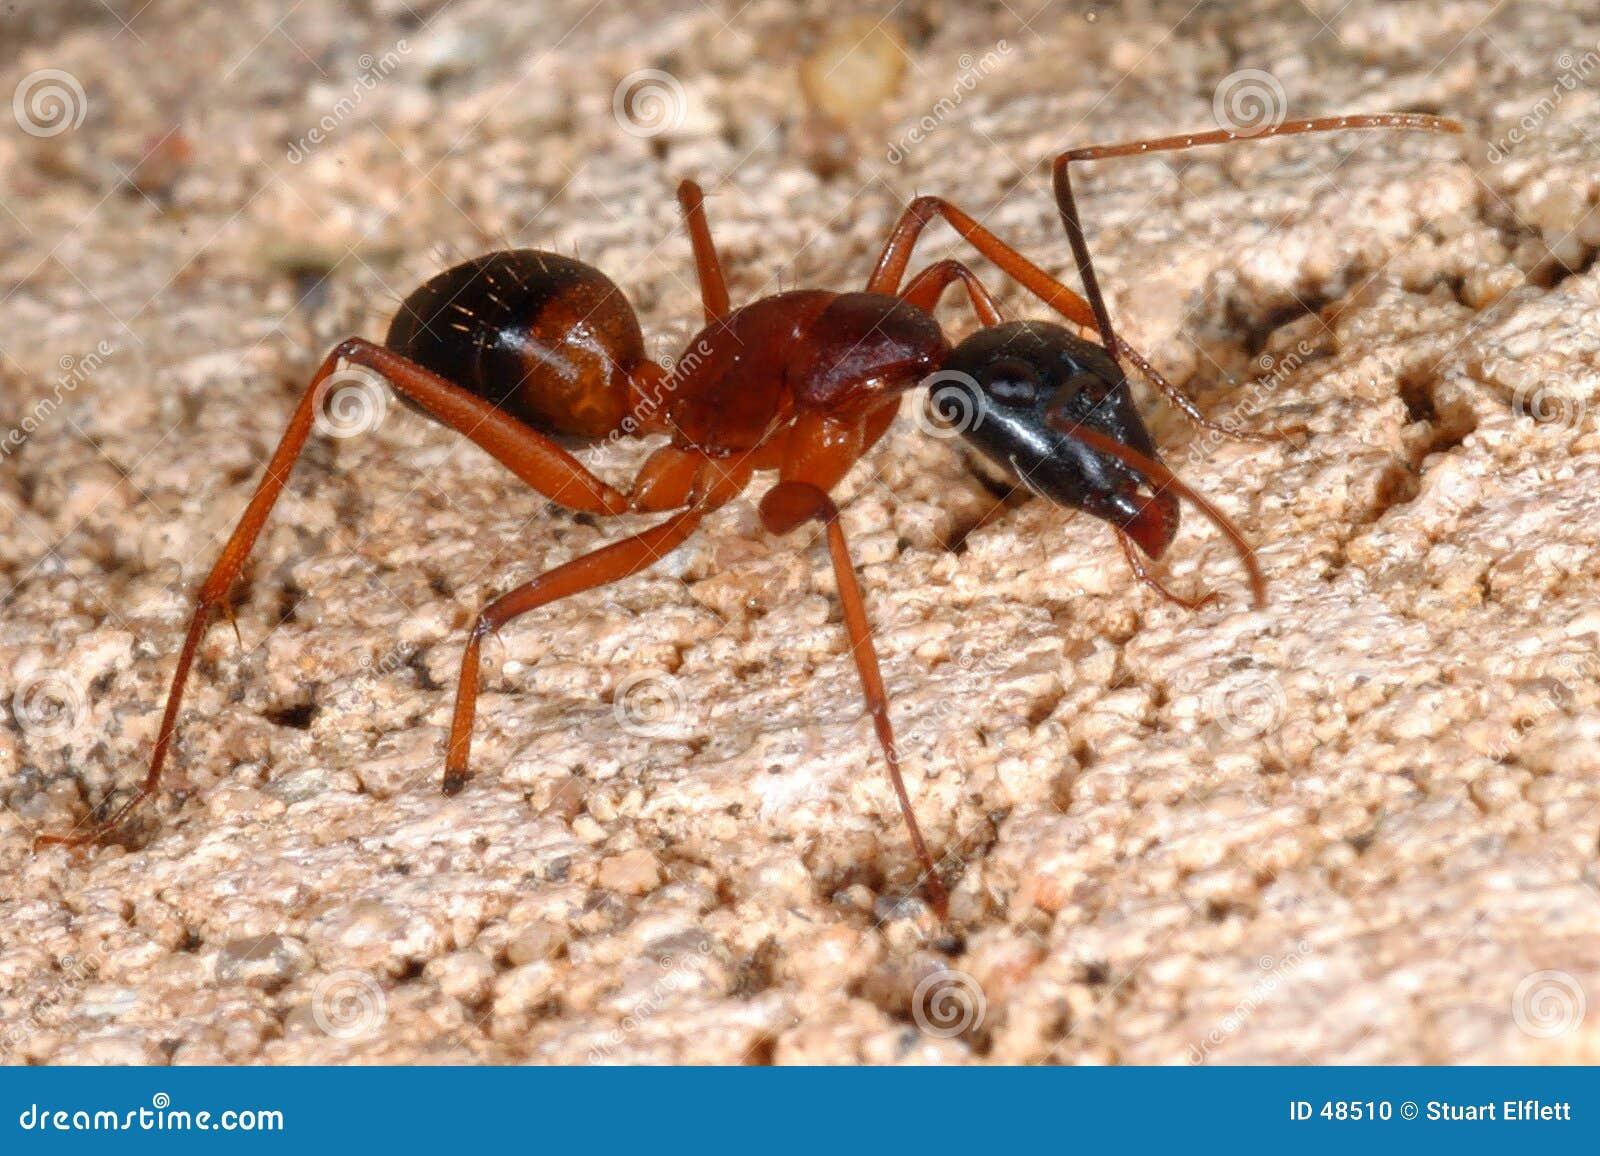 big-ant-48510.jpg